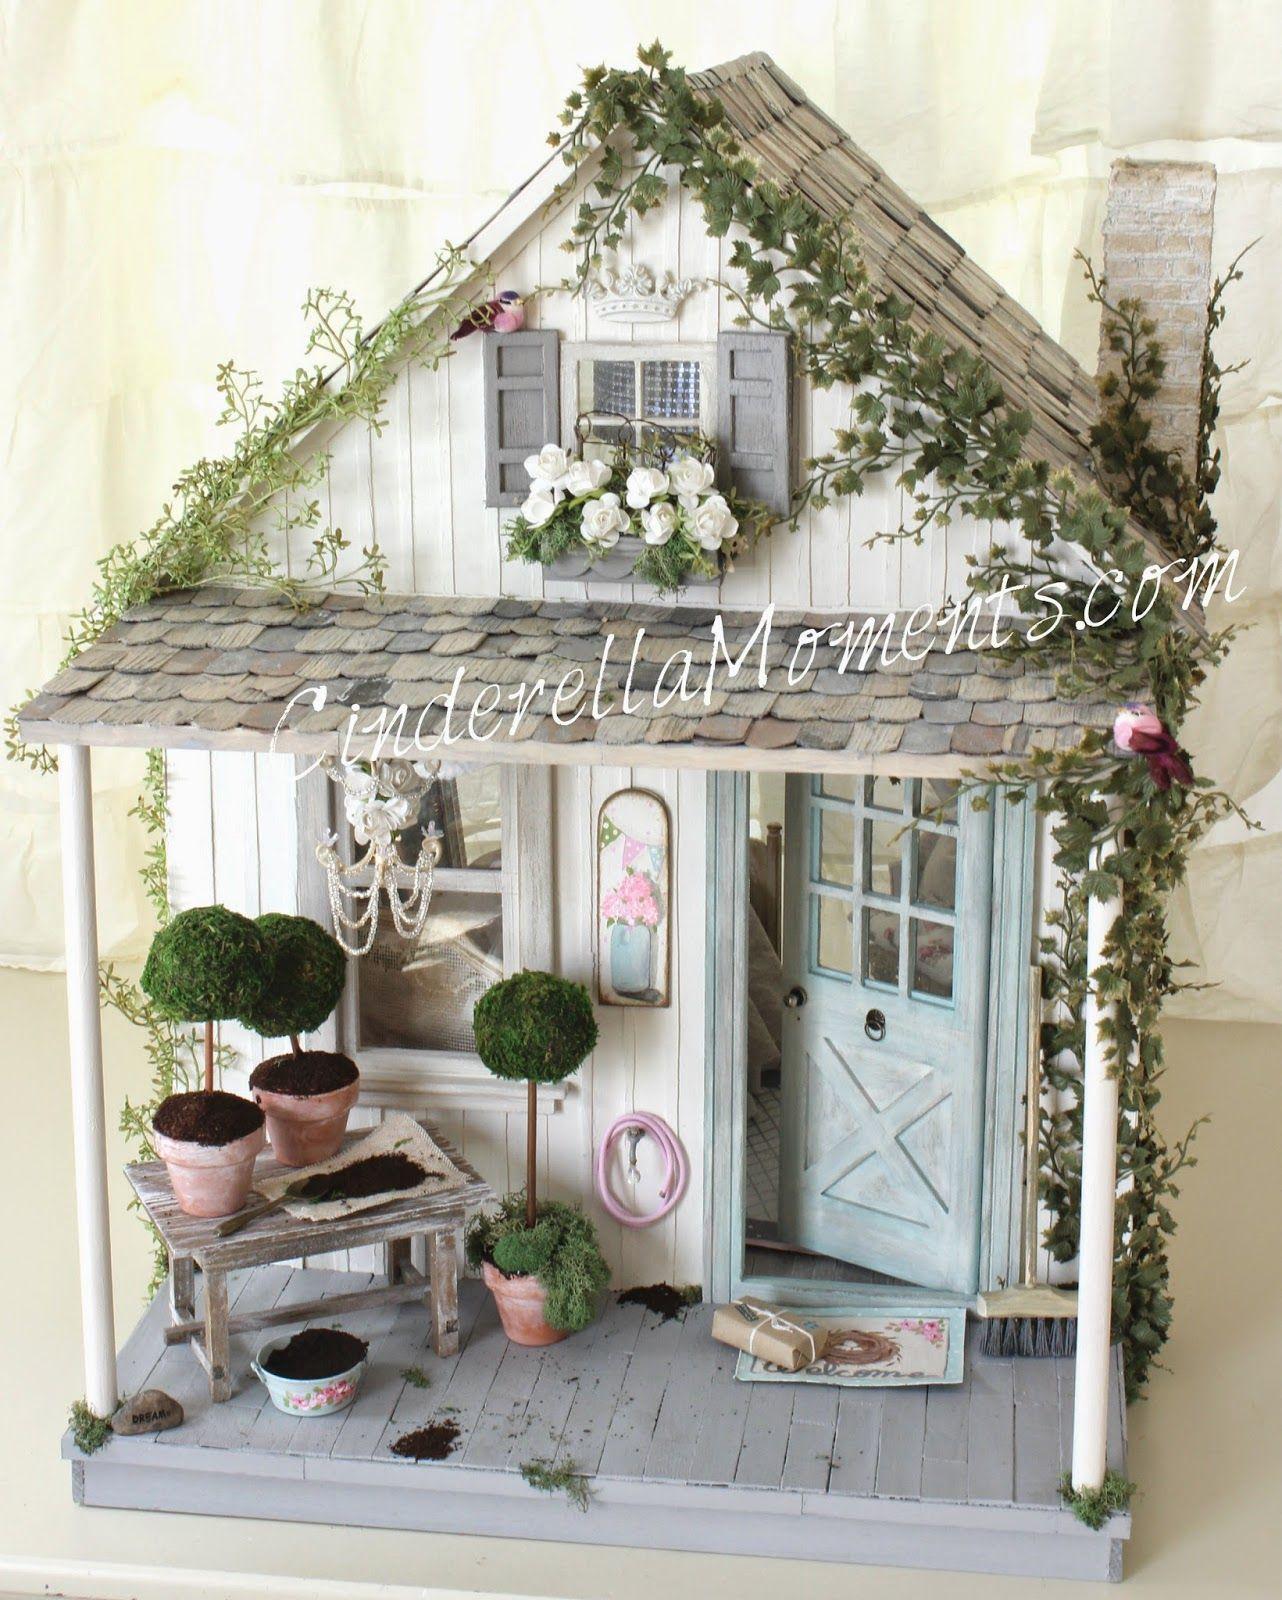 cinderella moments shabby blythe custom dollhouse crafting diy pinterest miniatur. Black Bedroom Furniture Sets. Home Design Ideas